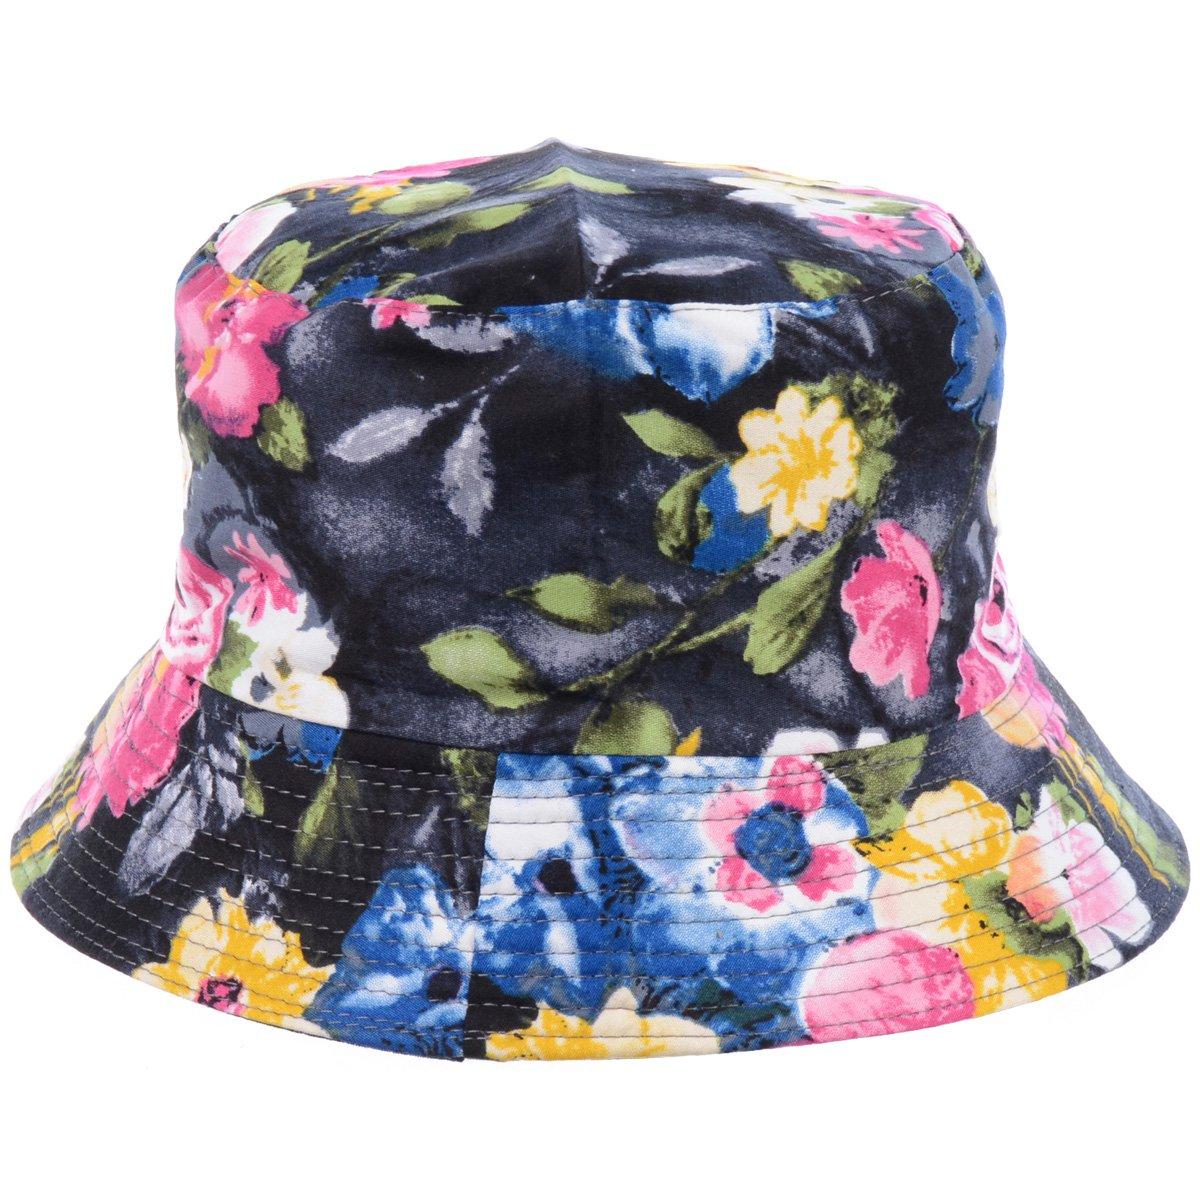 79964f75551 BYOS Fashion Packable Reversible Black Printed Fisherman Bucket Sun ...